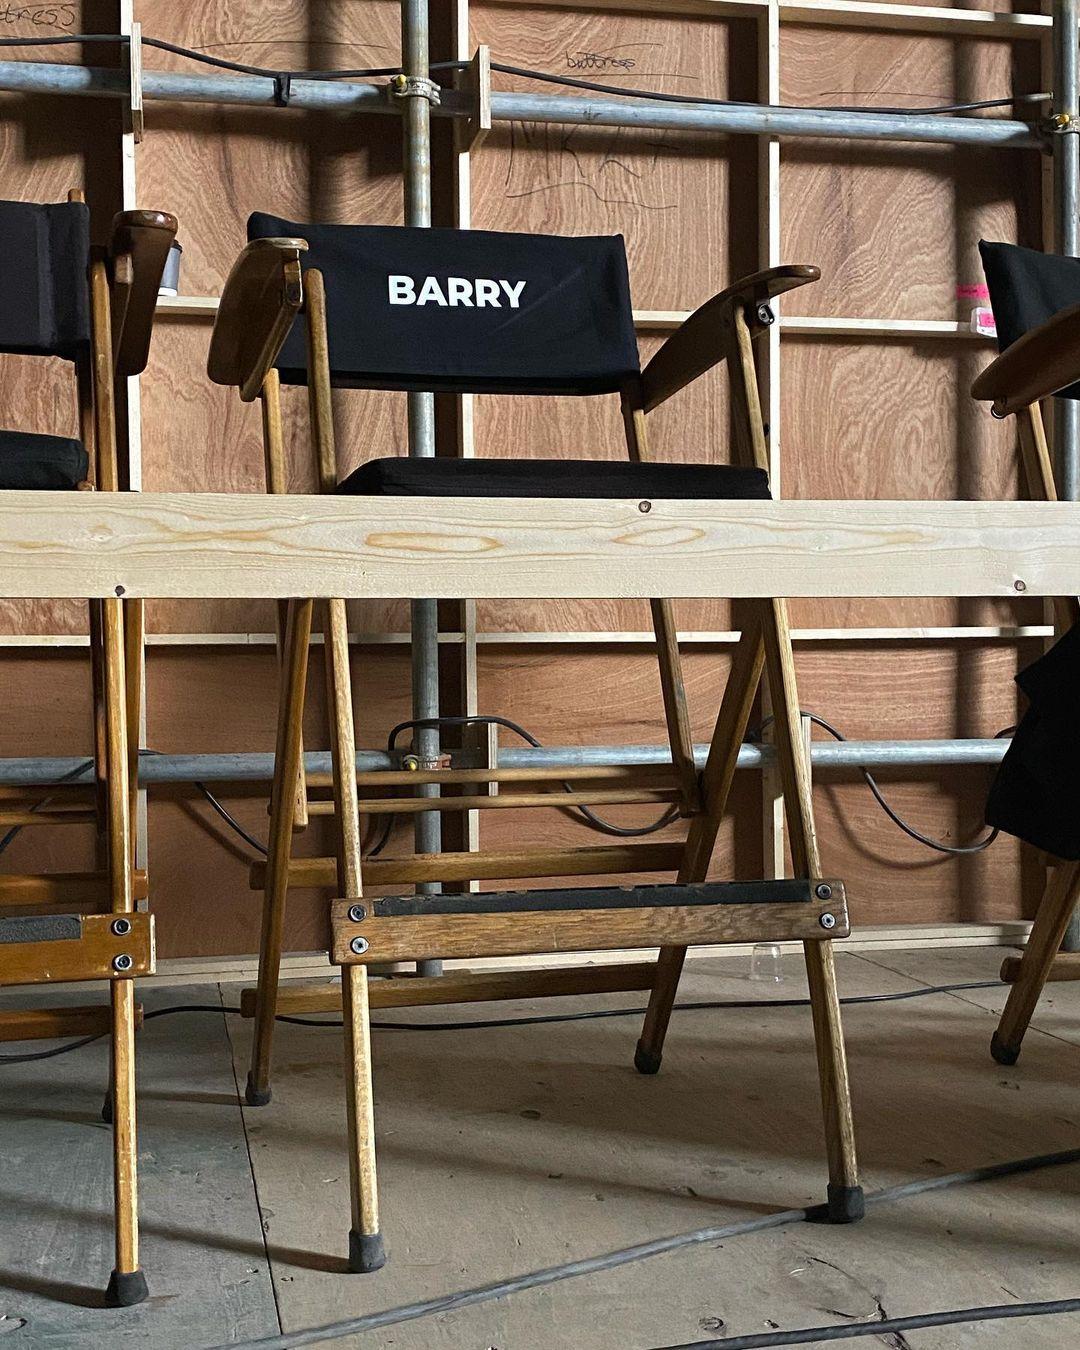 La silla de Barry Allen (Ezra Miller) en el set de The Flash (2022). Imagen: Andy Muschietti Instagram (@andy_muschietti).